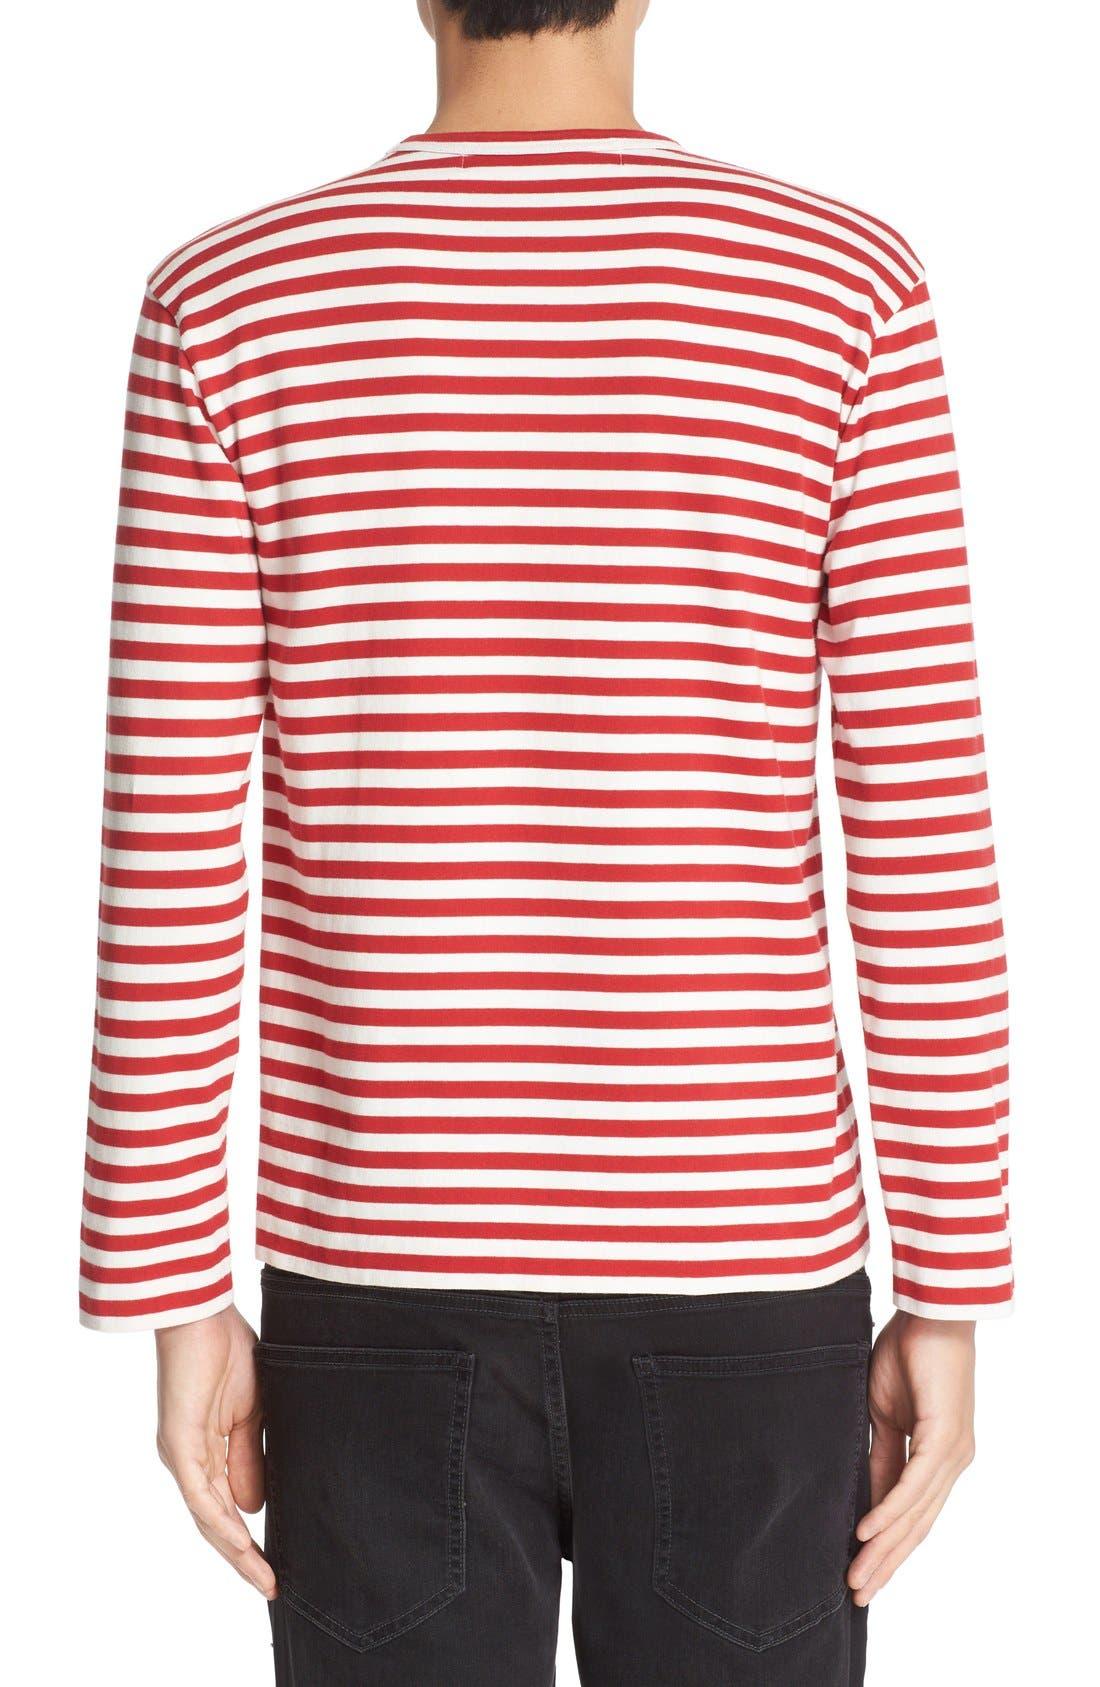 Comme des Garçons PLAY Stripe Long Sleeve T-Shirt,                             Alternate thumbnail 2, color,                             Red/ White